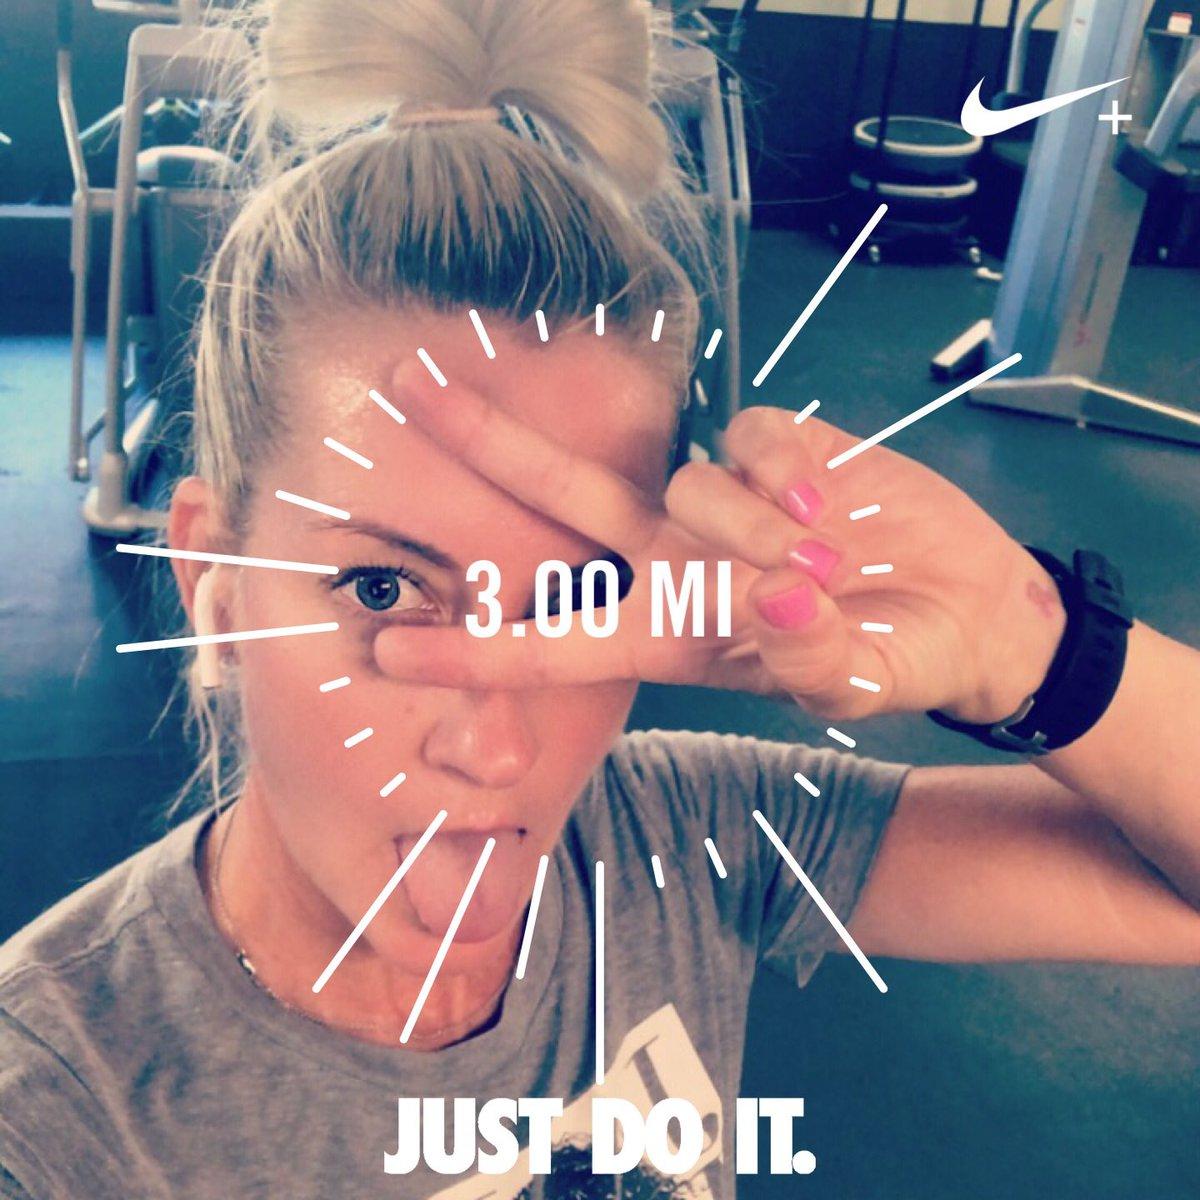 MONDAY-strength, endurance & cardio—>Ran 3.00 miles with Nike Run Club #Monday #justdoit #treadmillwork #Biotropics<br>http://pic.twitter.com/eCQyIJtsKC